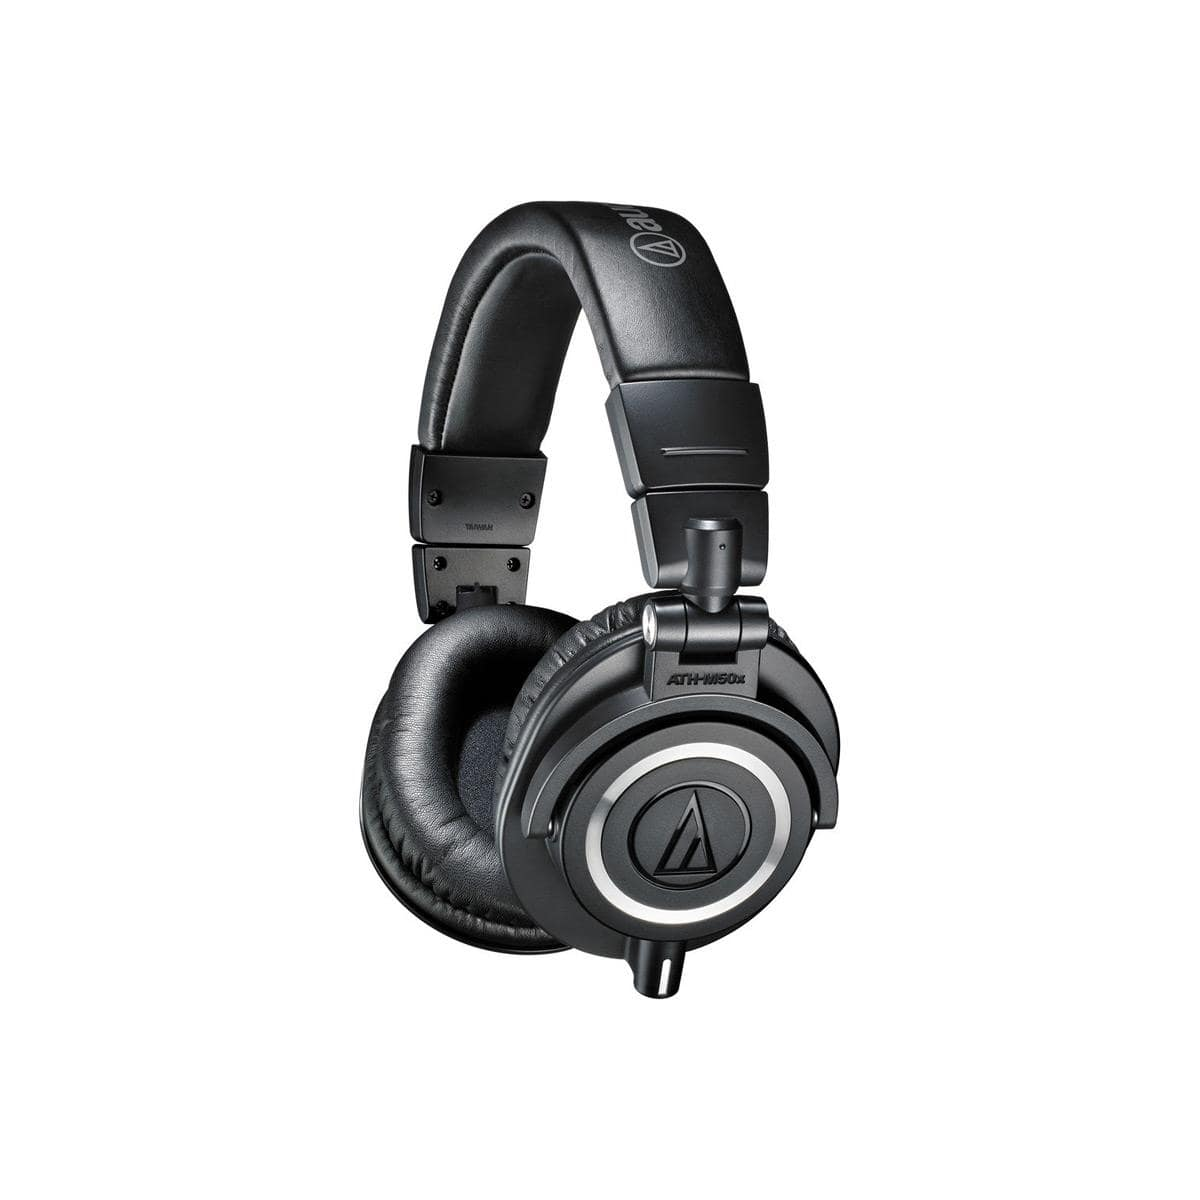 Audio-Technica ATH-M50x Headphones + $25 Adorama Gift Card $119 + free shipping